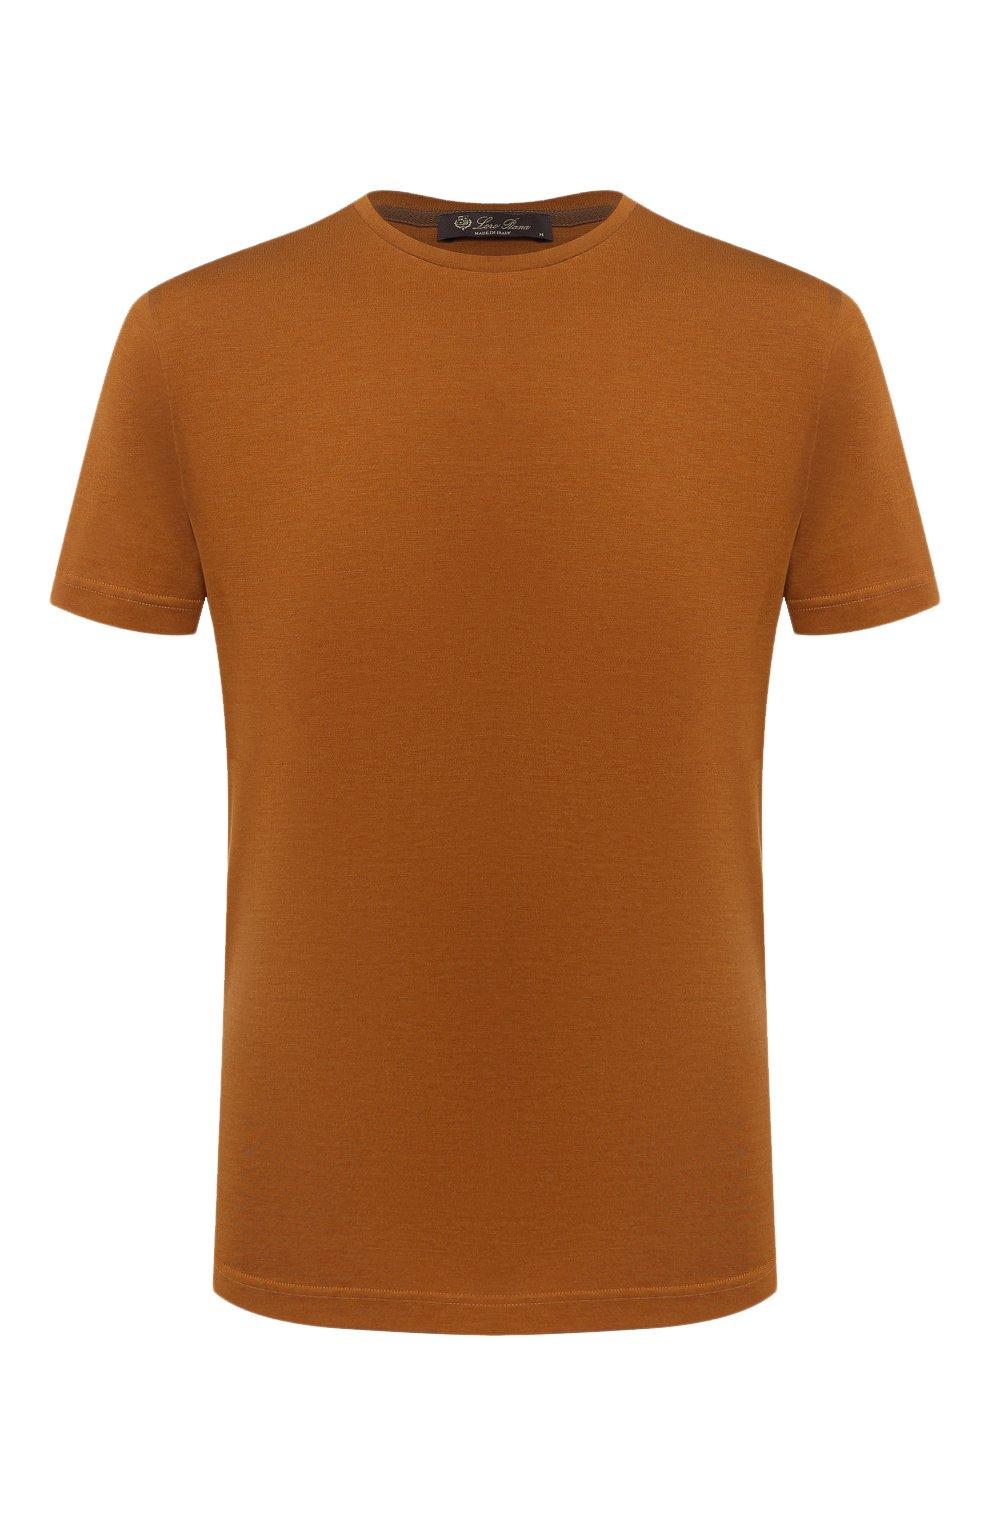 Мужская футболка из шелка и хлопка LORO PIANA светло-коричневого цвета, арт. FAF6128 | Фото 1